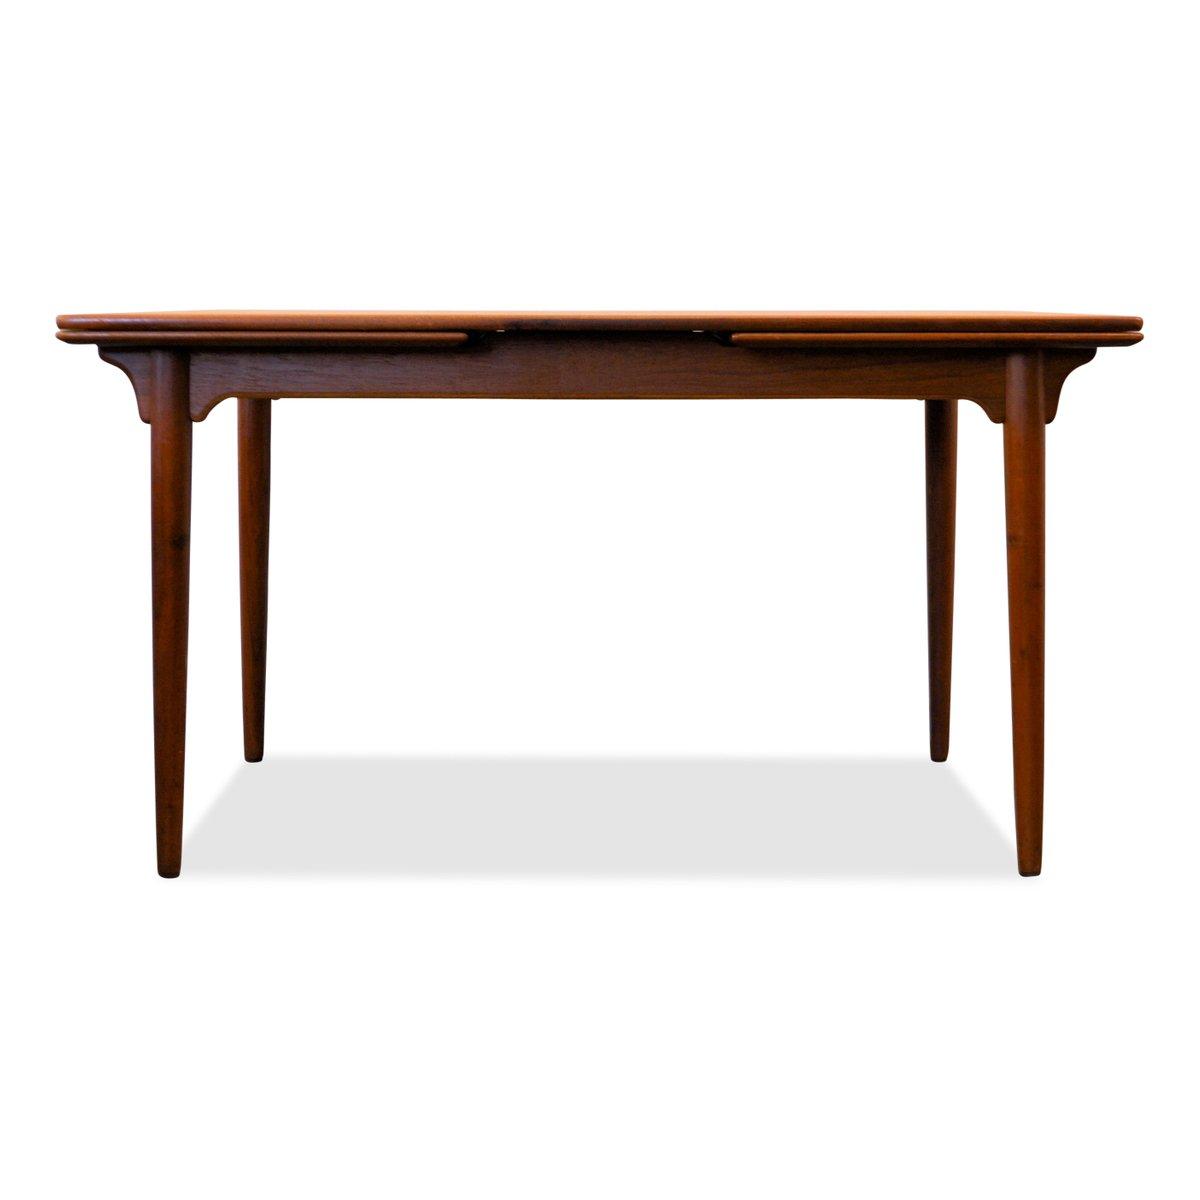 Danish Teak Extendable Dining Table from Omann Juns  : danish teak extendable dining table from omann juns mobelfabrik 1960s 1 from www.pamono.com size 1200 x 1200 jpeg 33kB